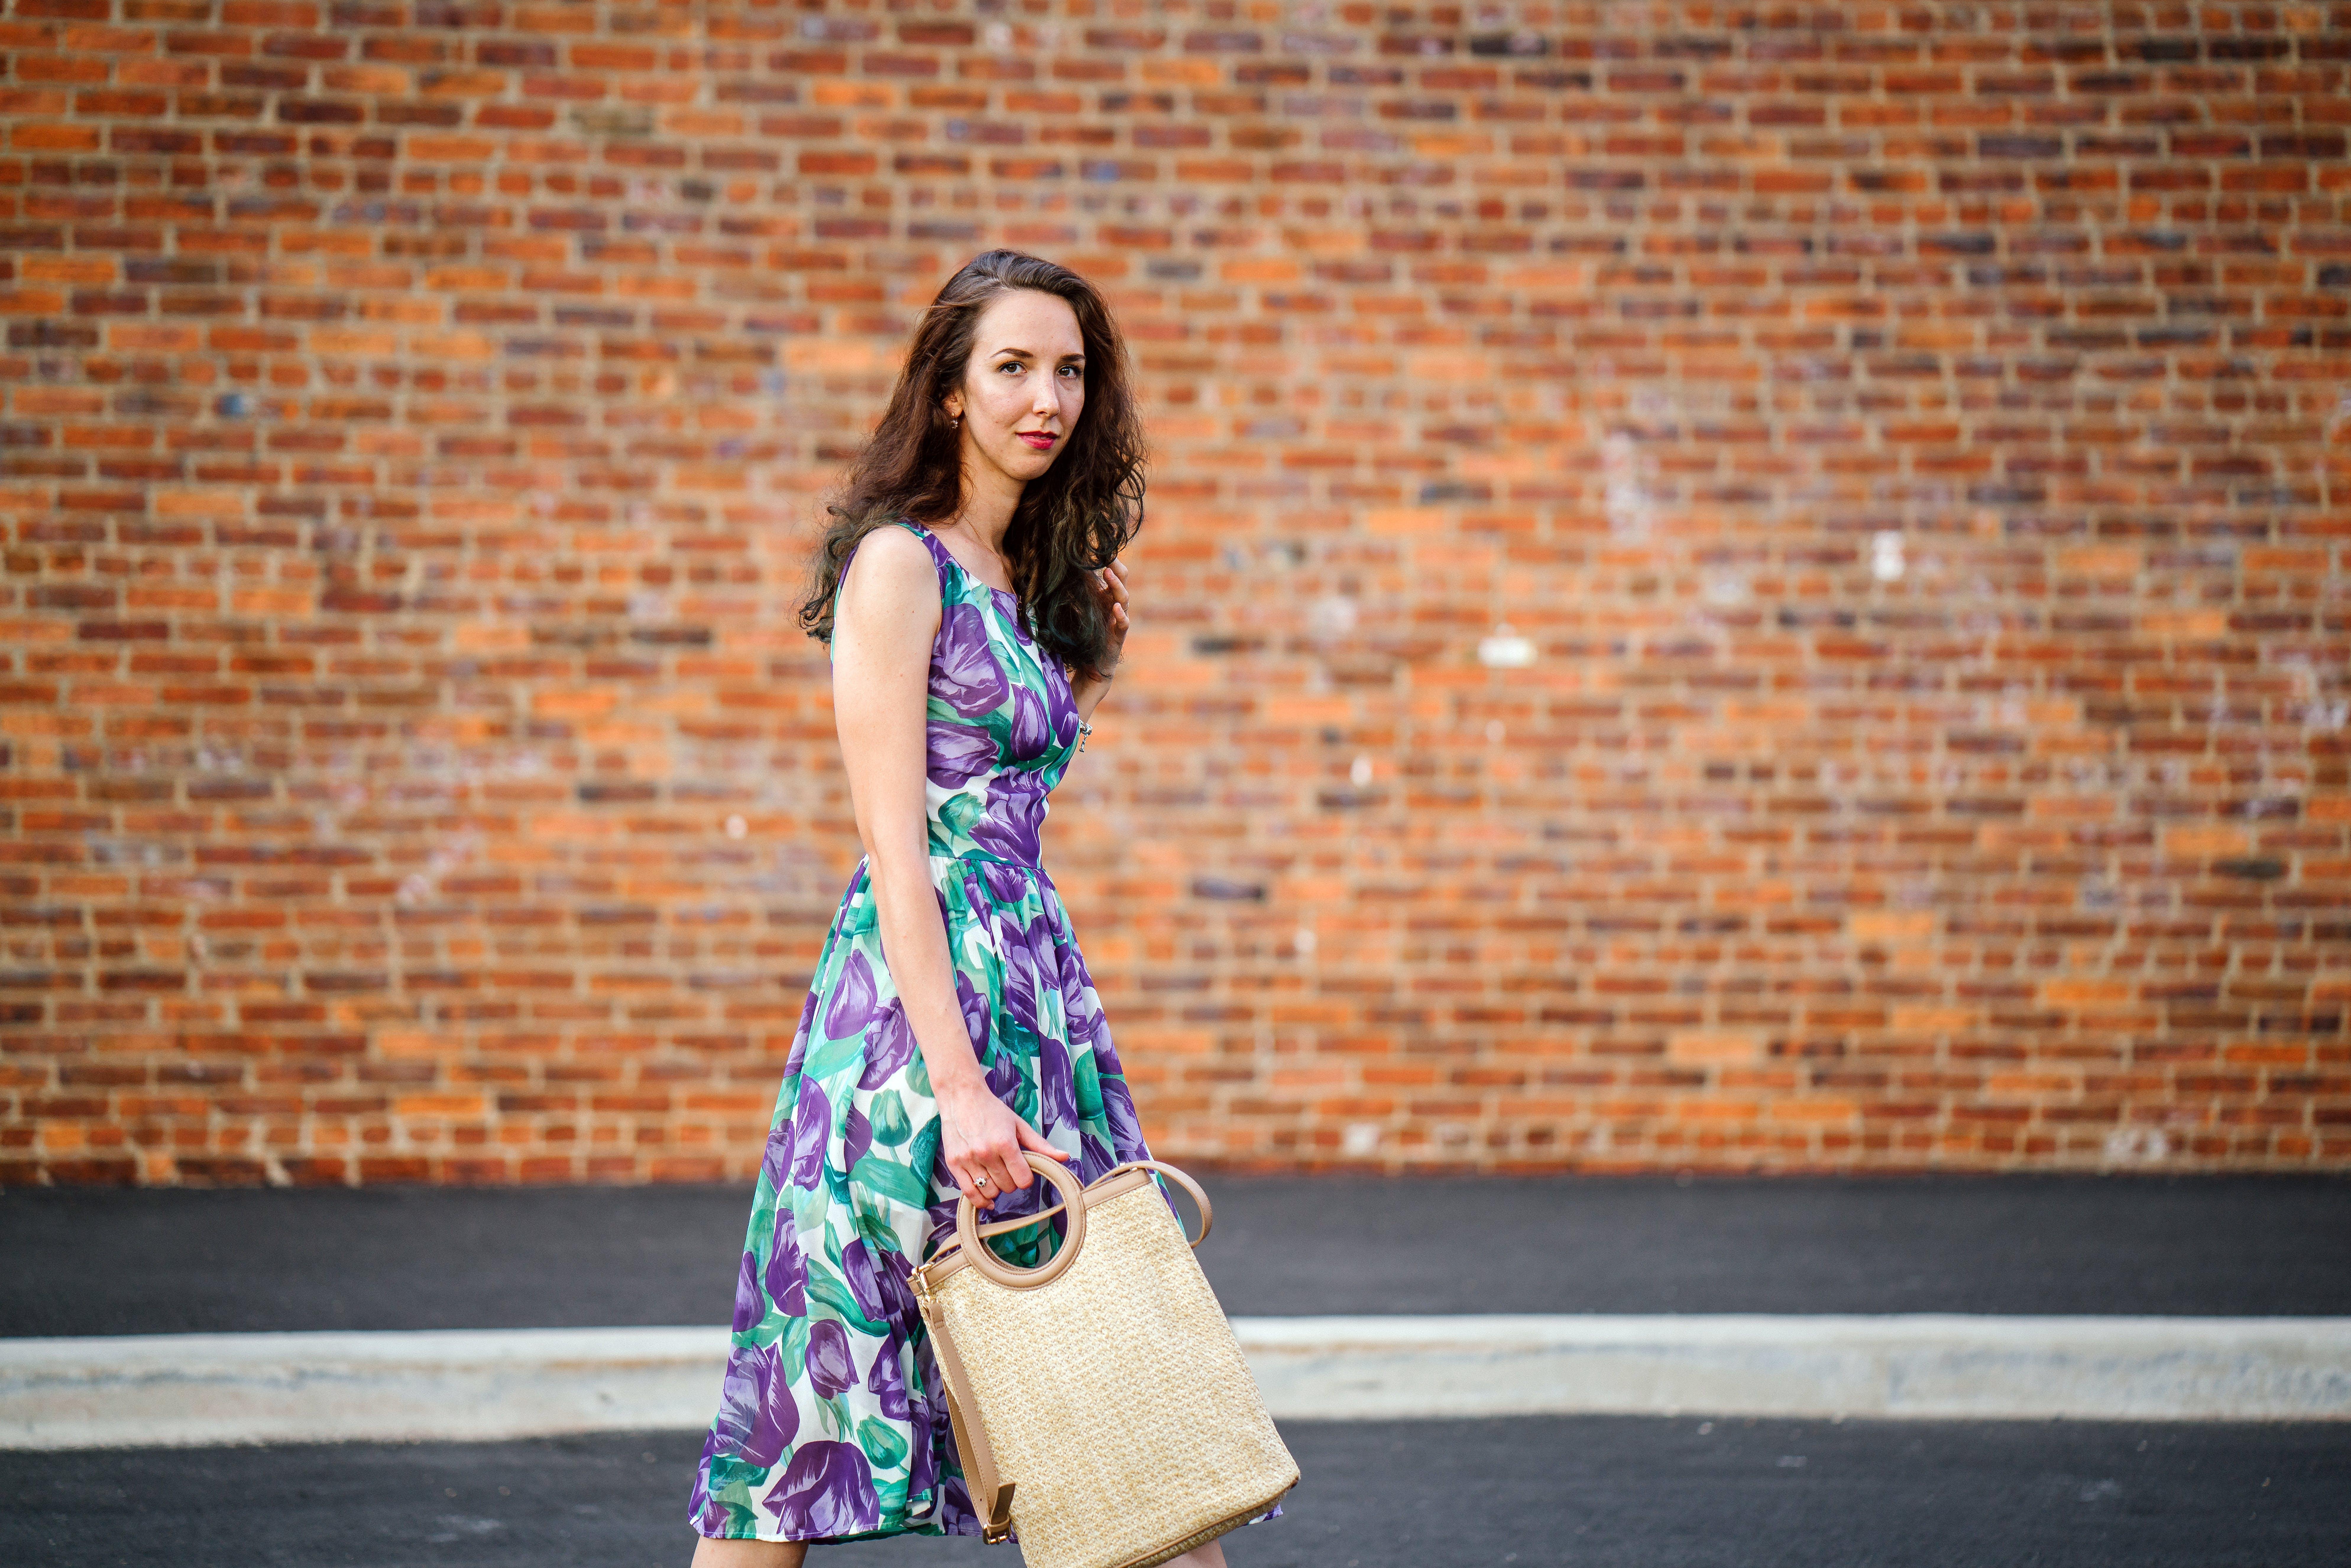 Kostenloses Stock Foto zu dame, fashion, frau, gehen